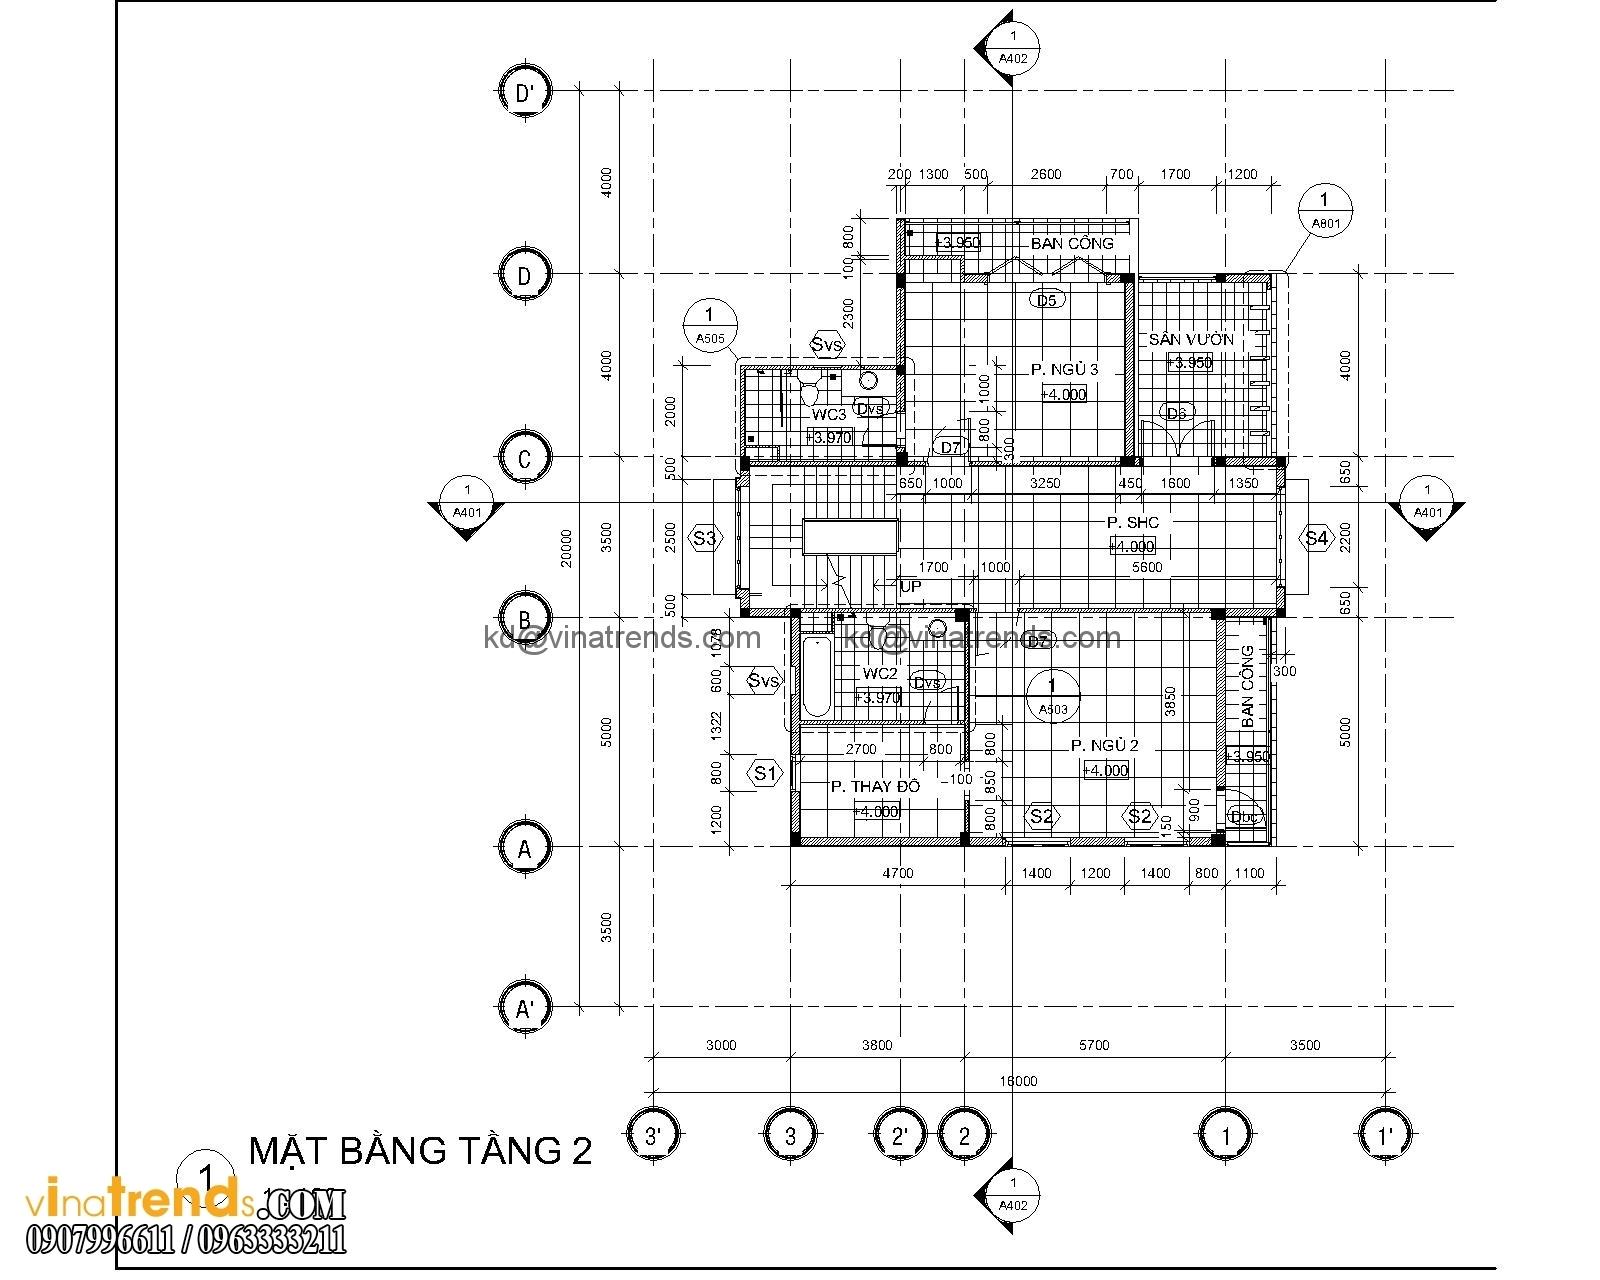 mat bang biet thu hien dai 3 tang 18x20m (7)